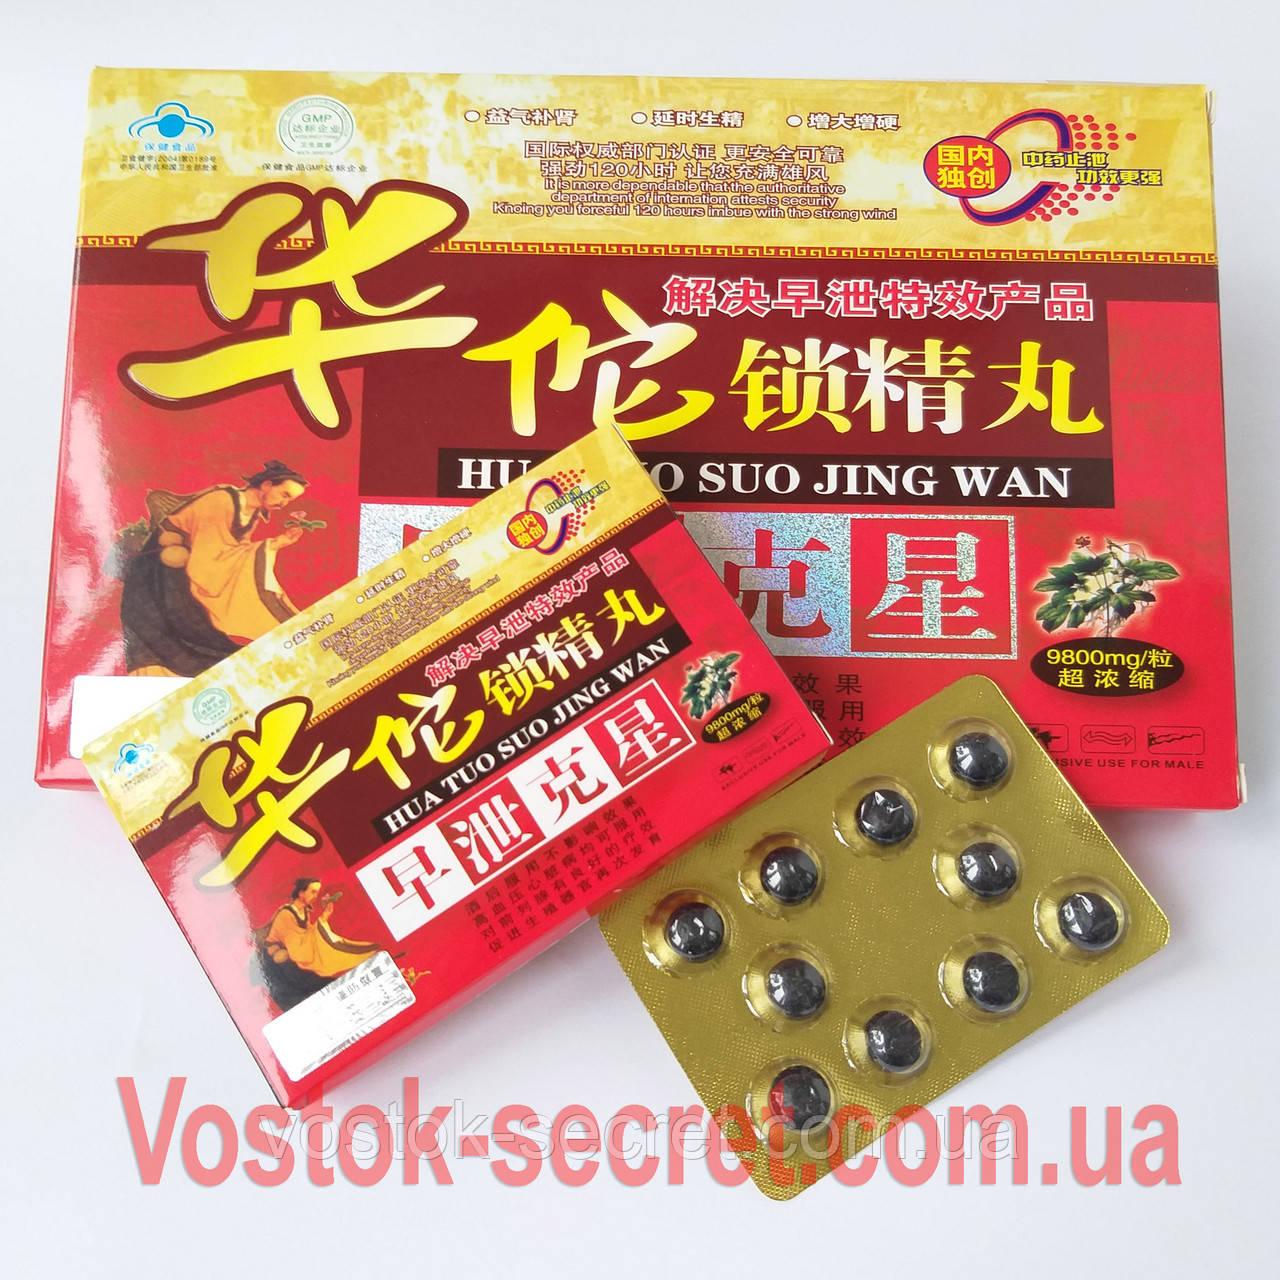 Пилюли для потенции Хуато, Hua Tuo Suo Jing Wan, 10табл